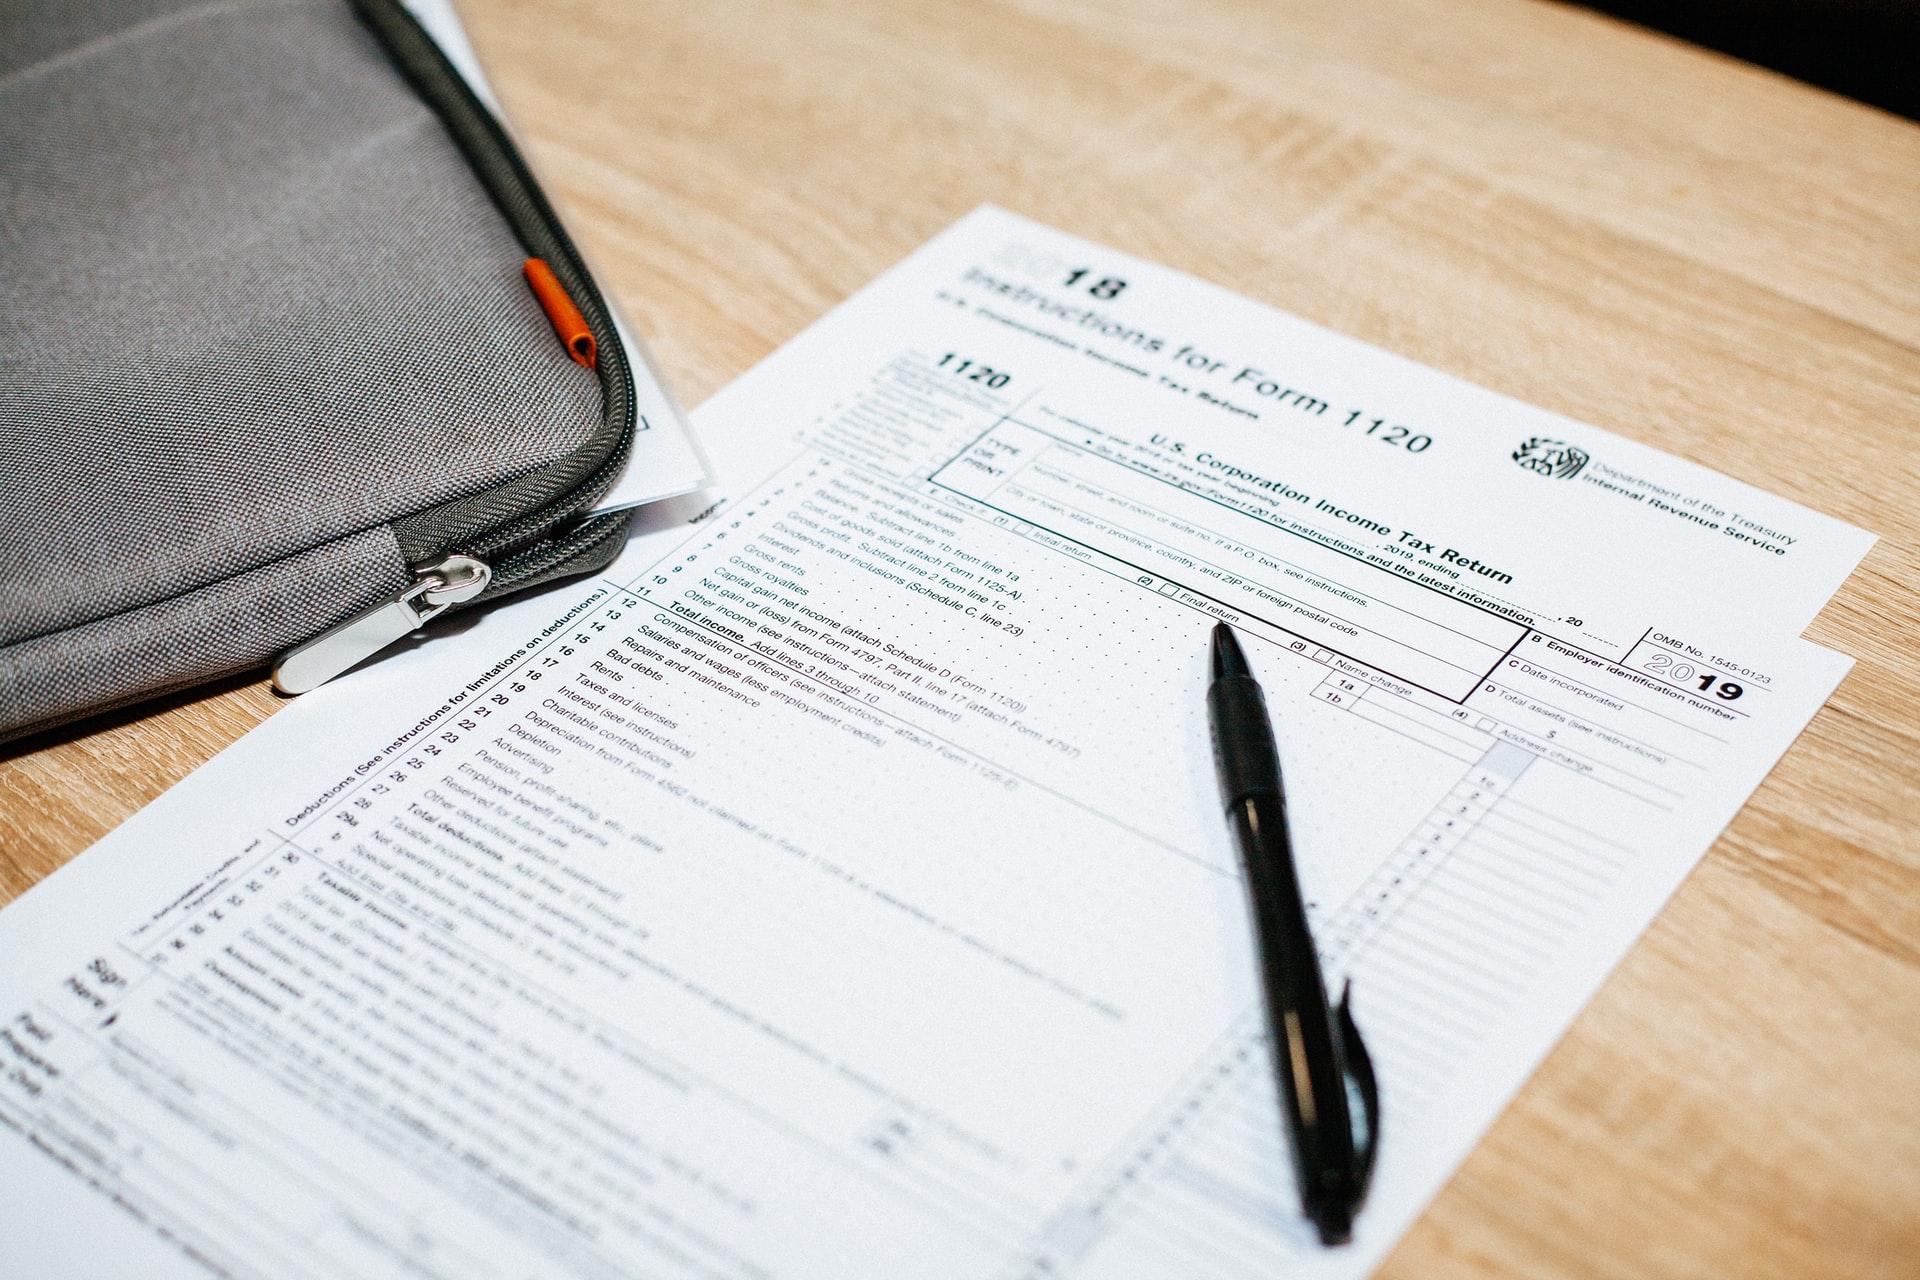 Vendors: Taxes